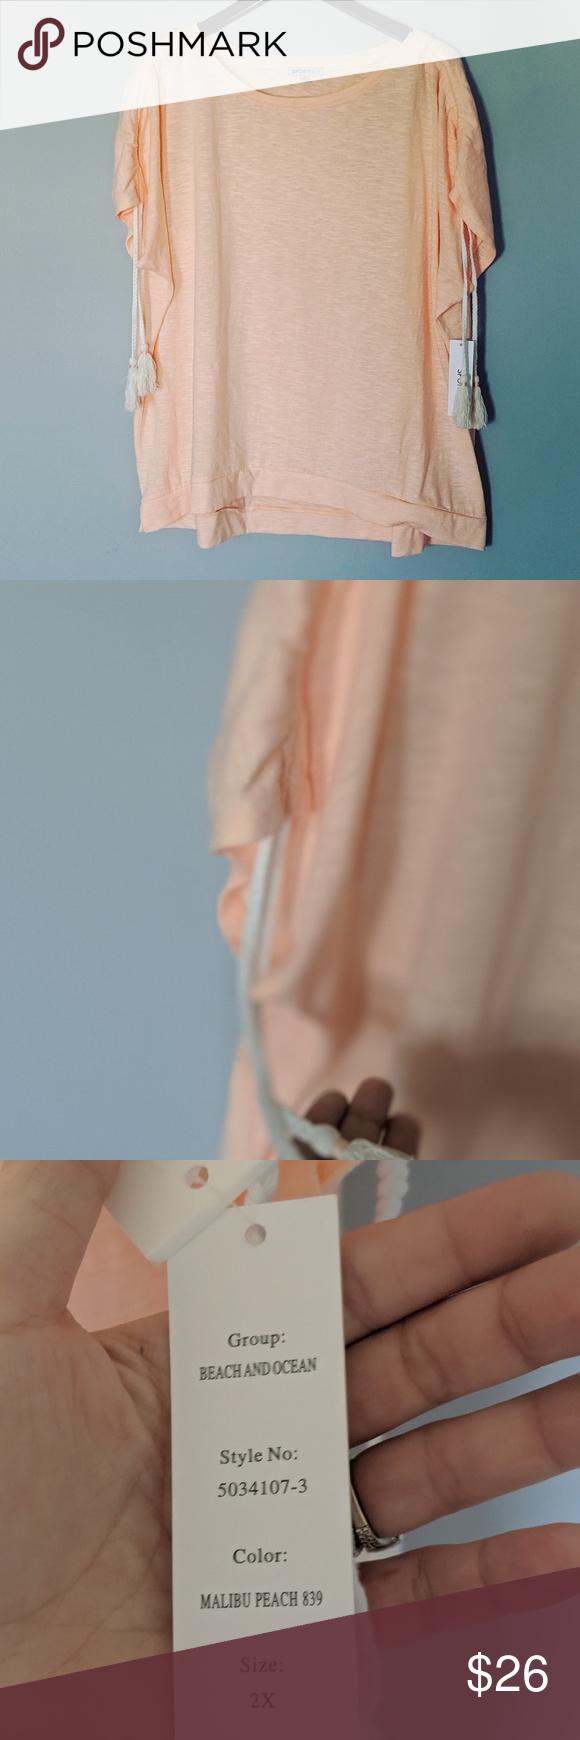 New Sportelle Plus Malibu Peach Tassel Shirt Ocean Fashion Clothes Design Hot Pink Maxi Dress [ 1740 x 580 Pixel ]